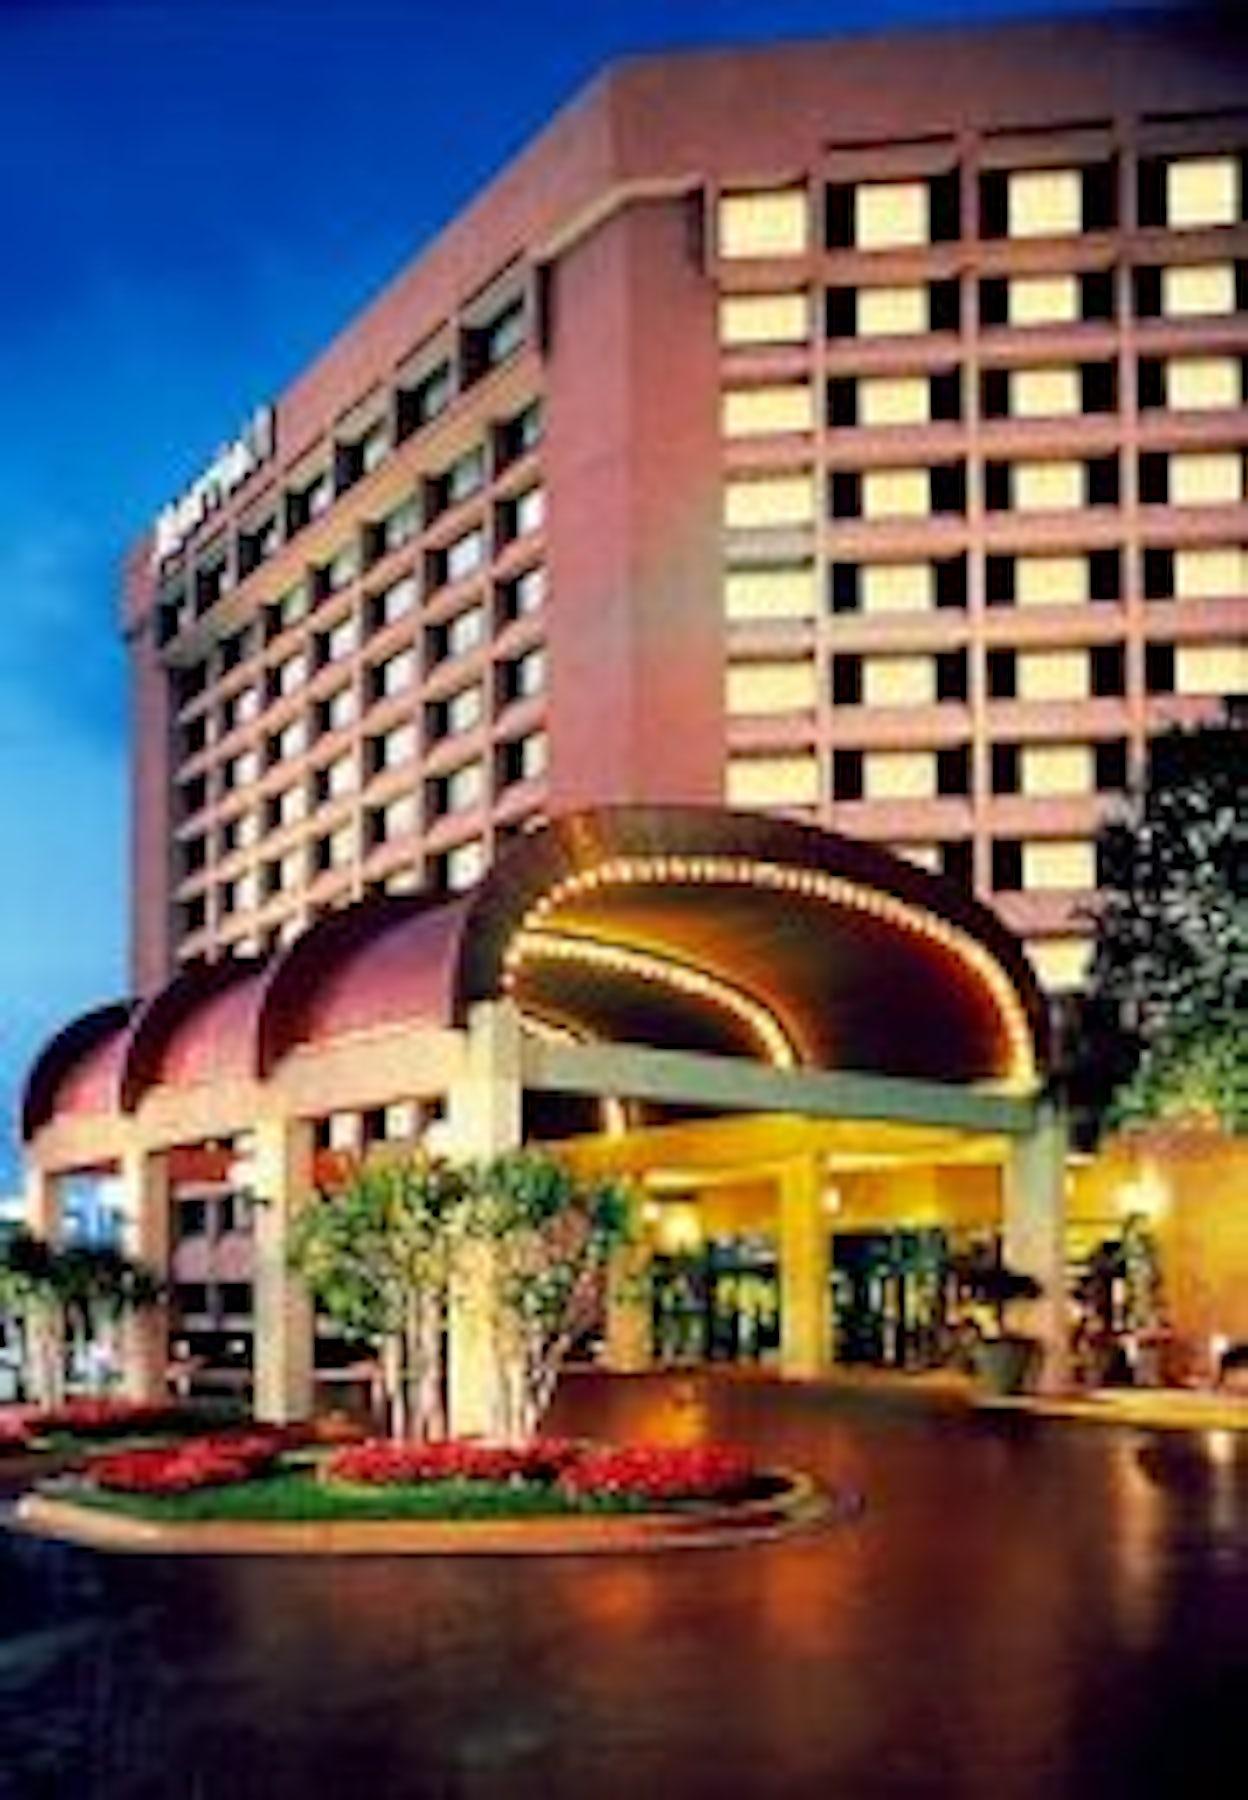 Dallas/Addison Marriott Quorum by the Galleria in Beyond Dallas